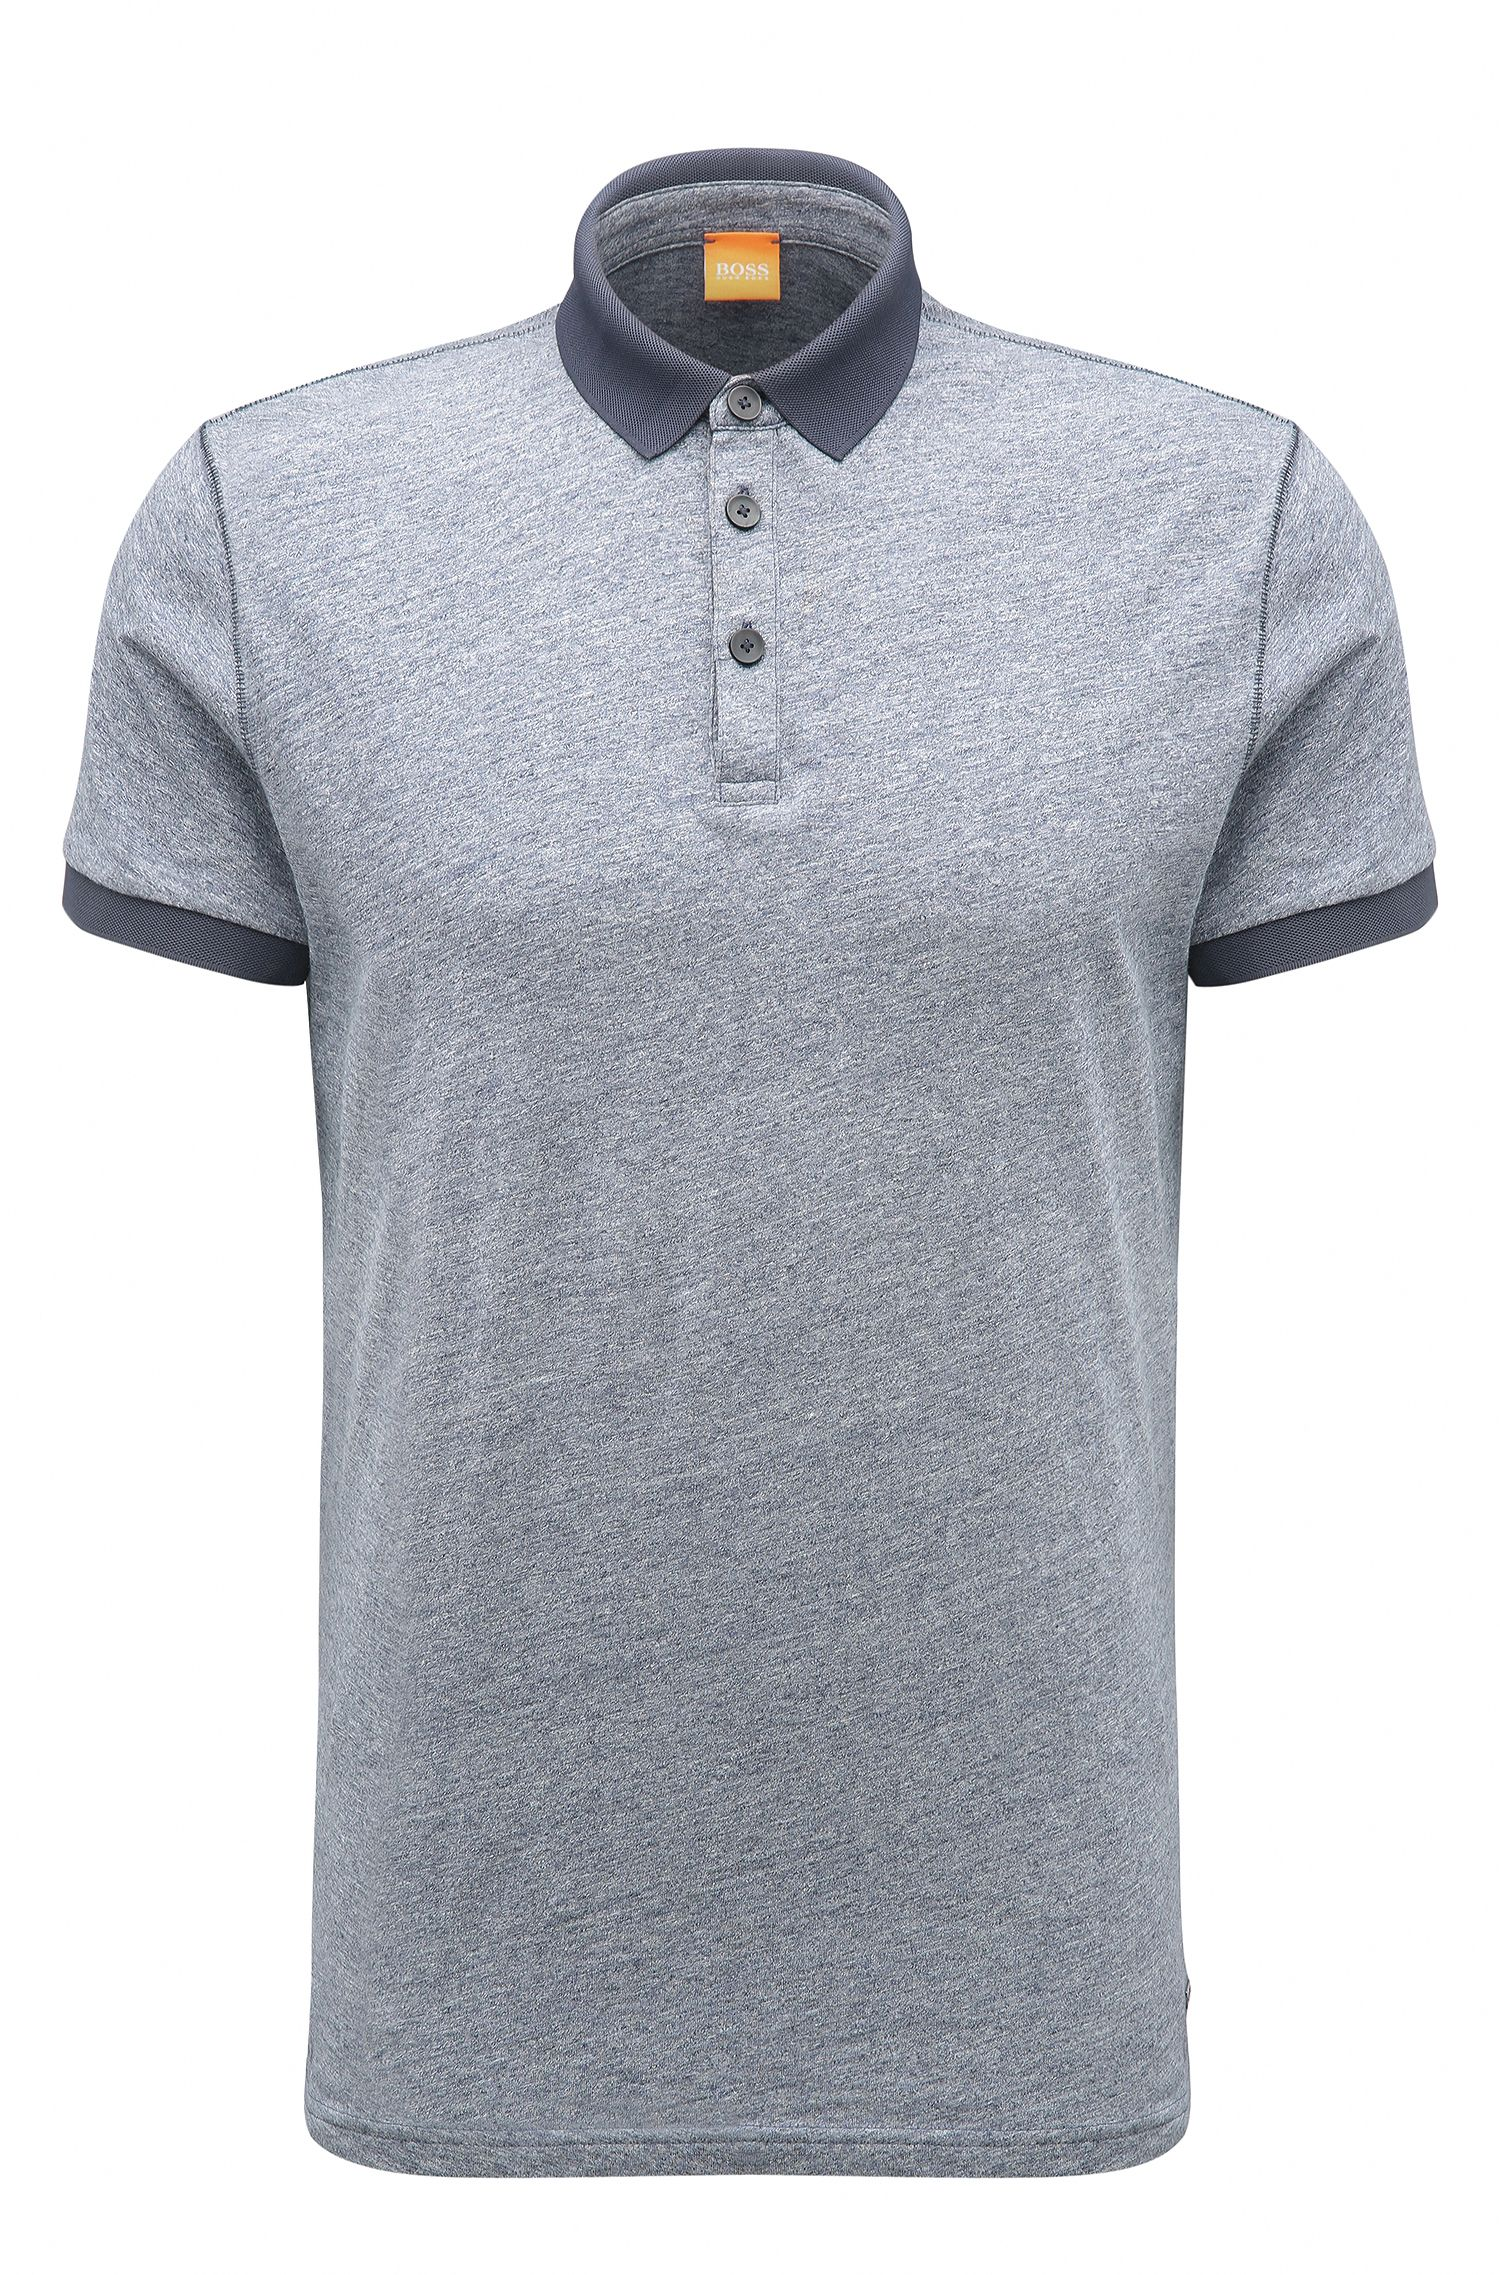 Melange Cotton Polo Shirt, Regular Fit | Performer, Dark Blue